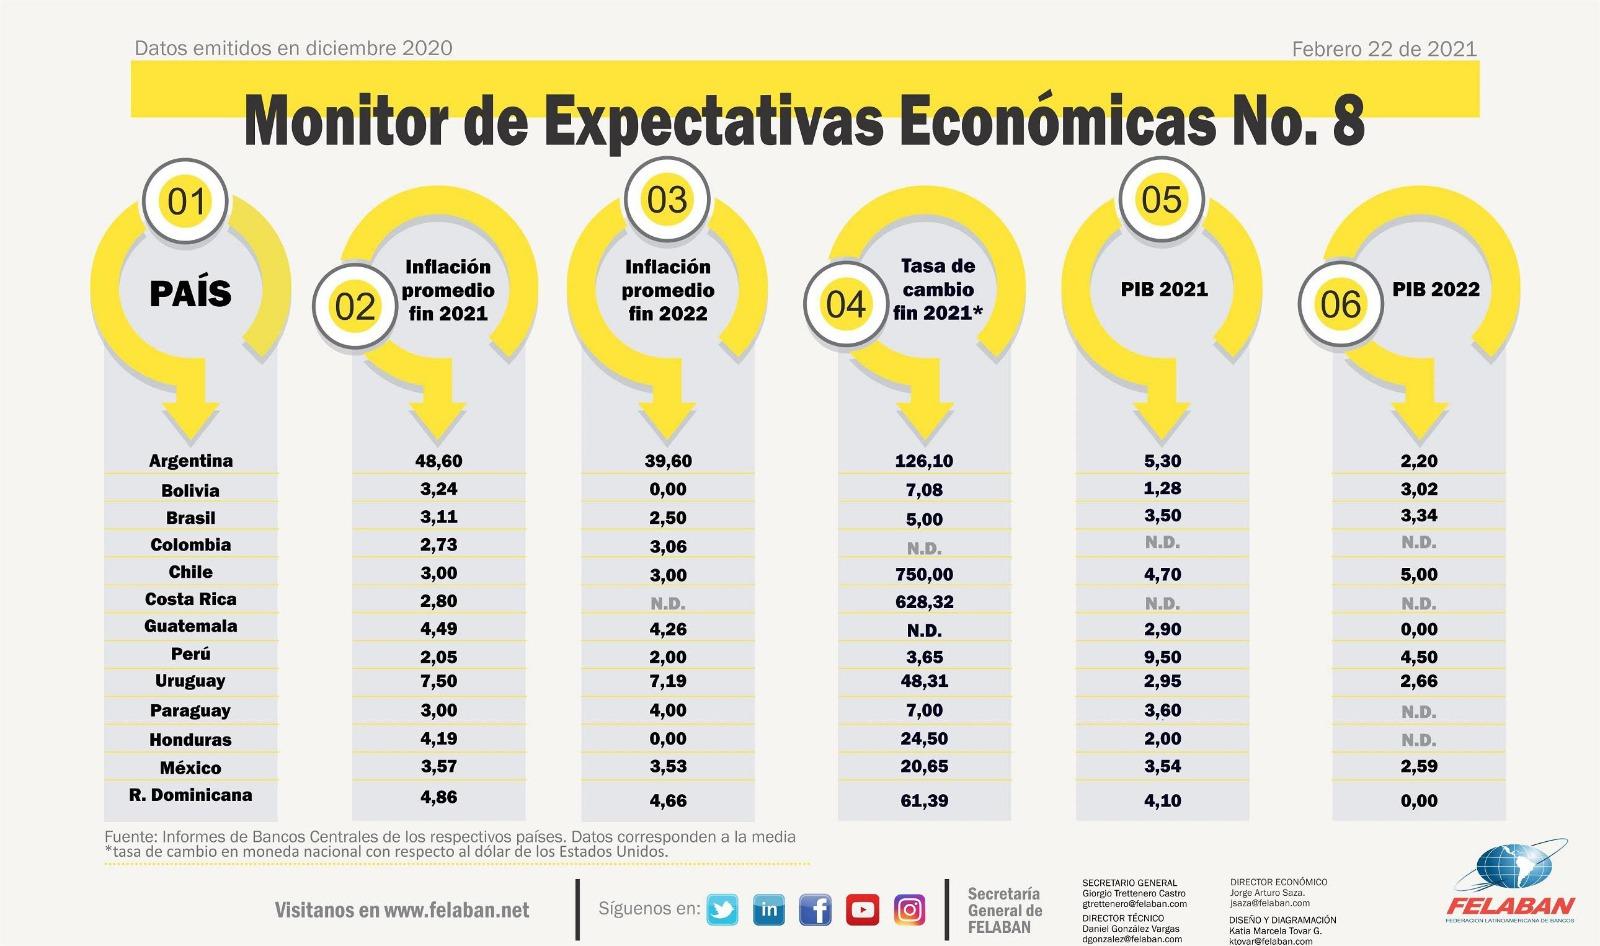 Expectativas Económicas #8